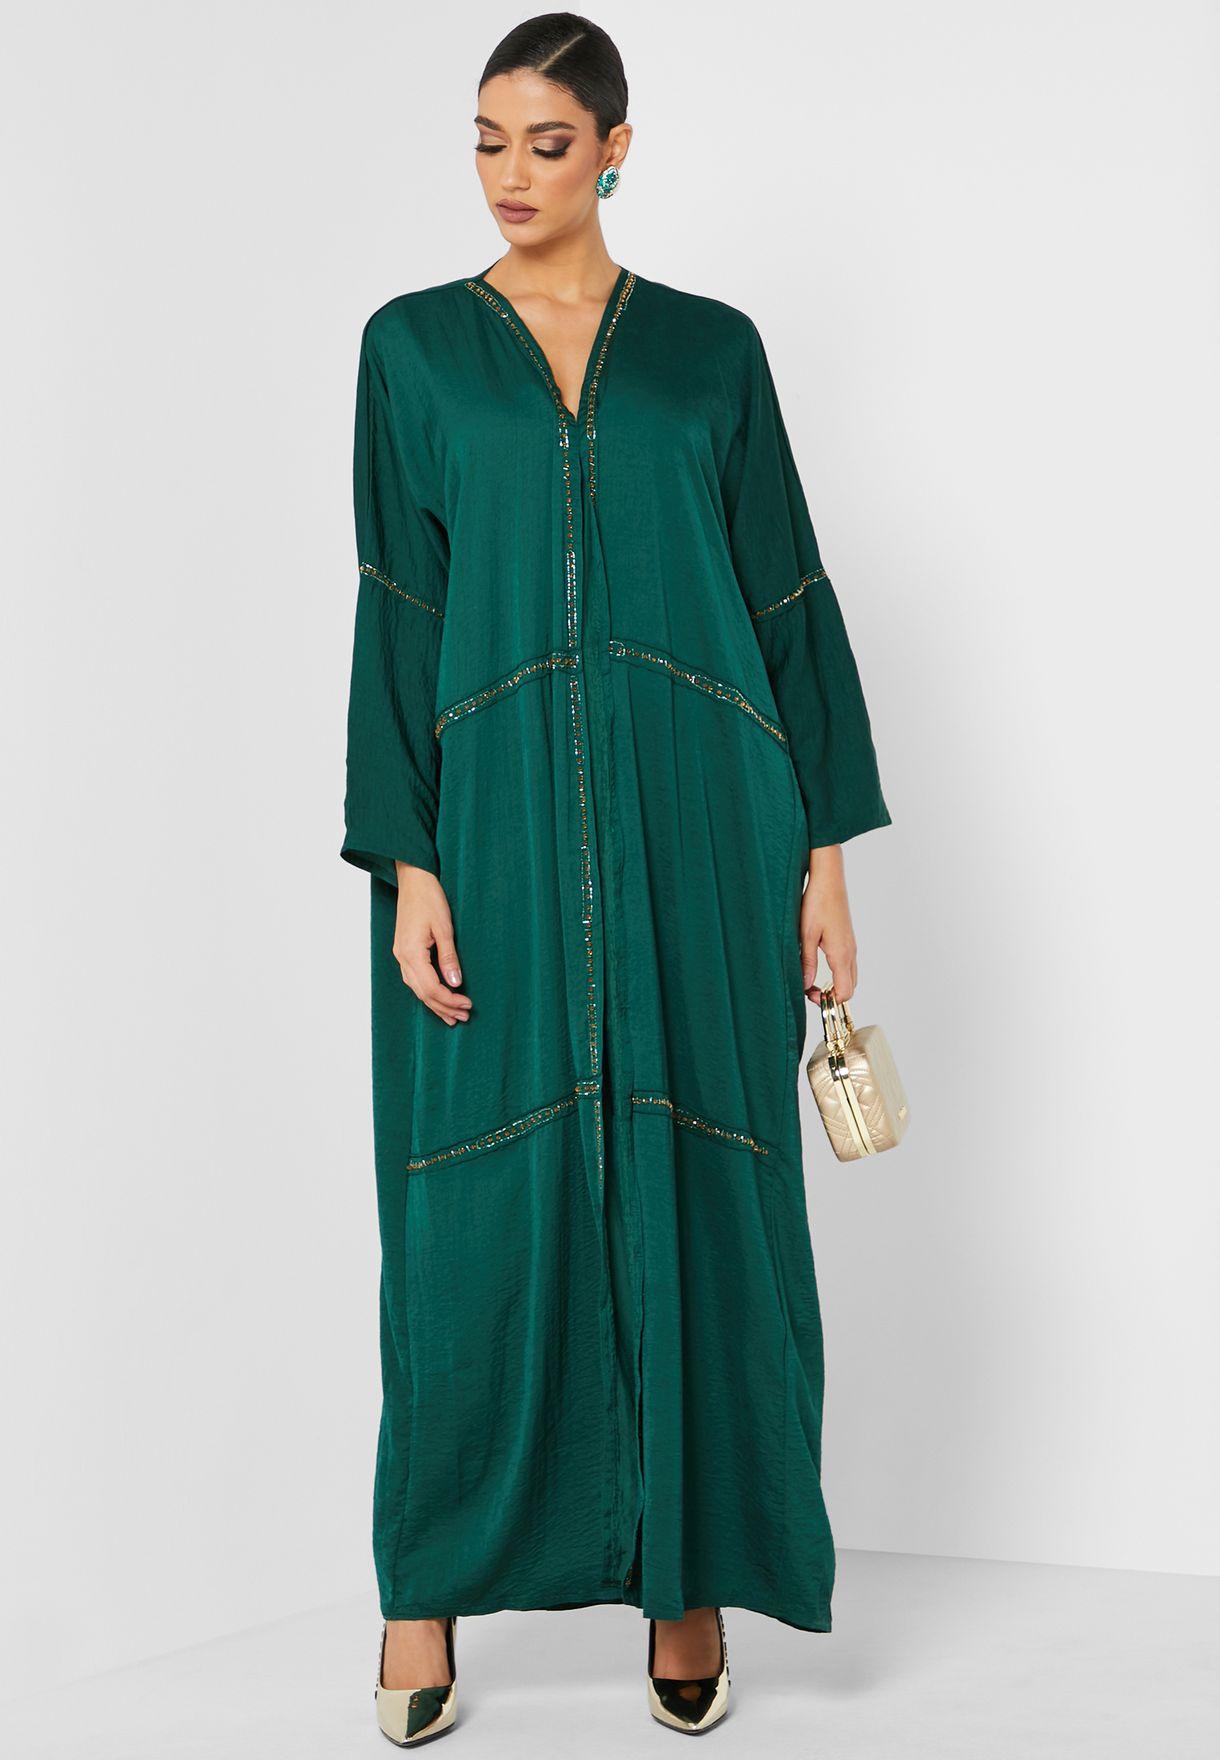 Embellished Detail Abaya